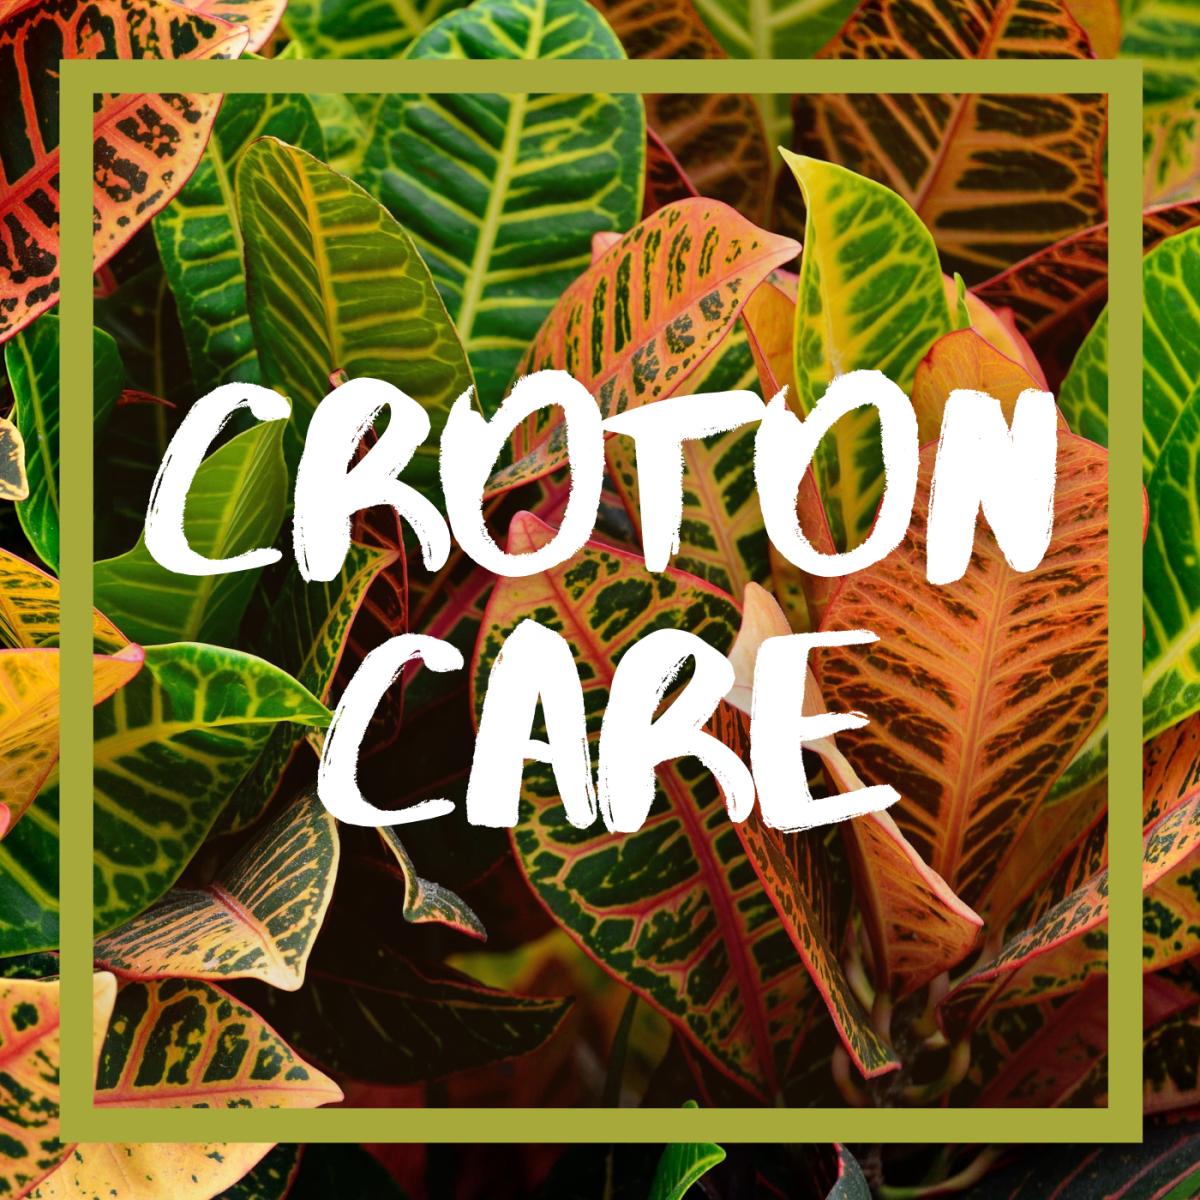 Croton houseplant care.